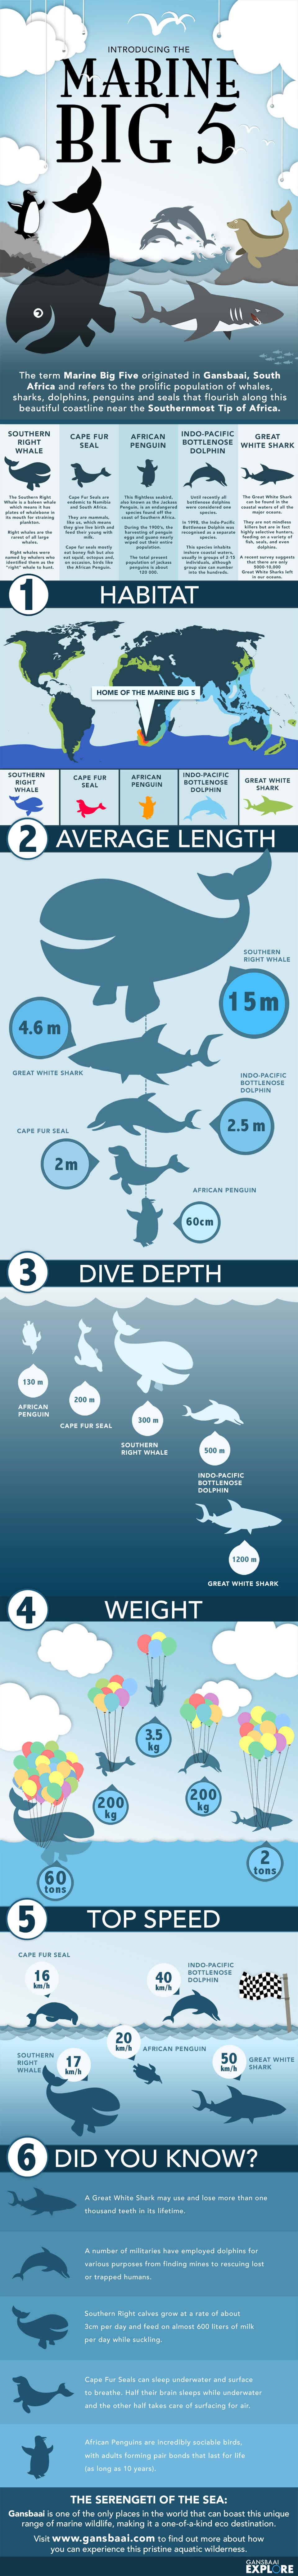 marine-big-5-infographic-galleryr